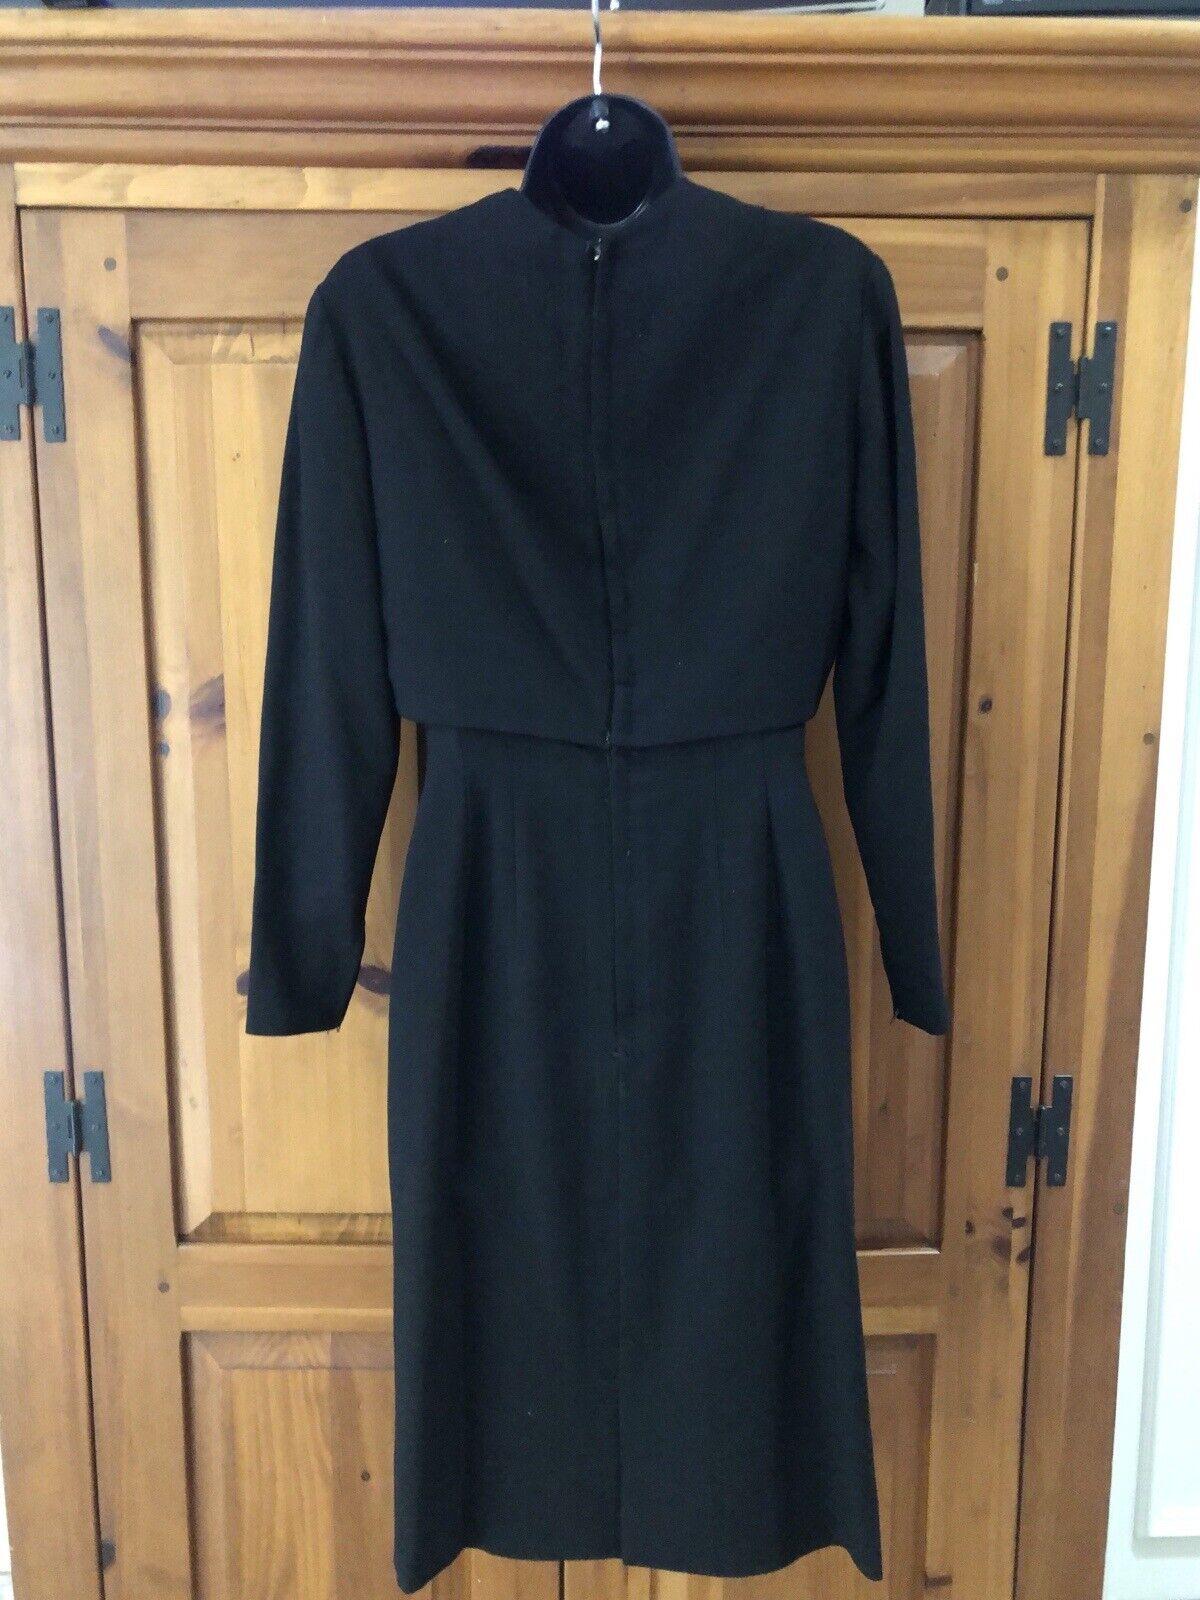 Travilla vintage 60s/70s black wool crepe dress s… - image 7